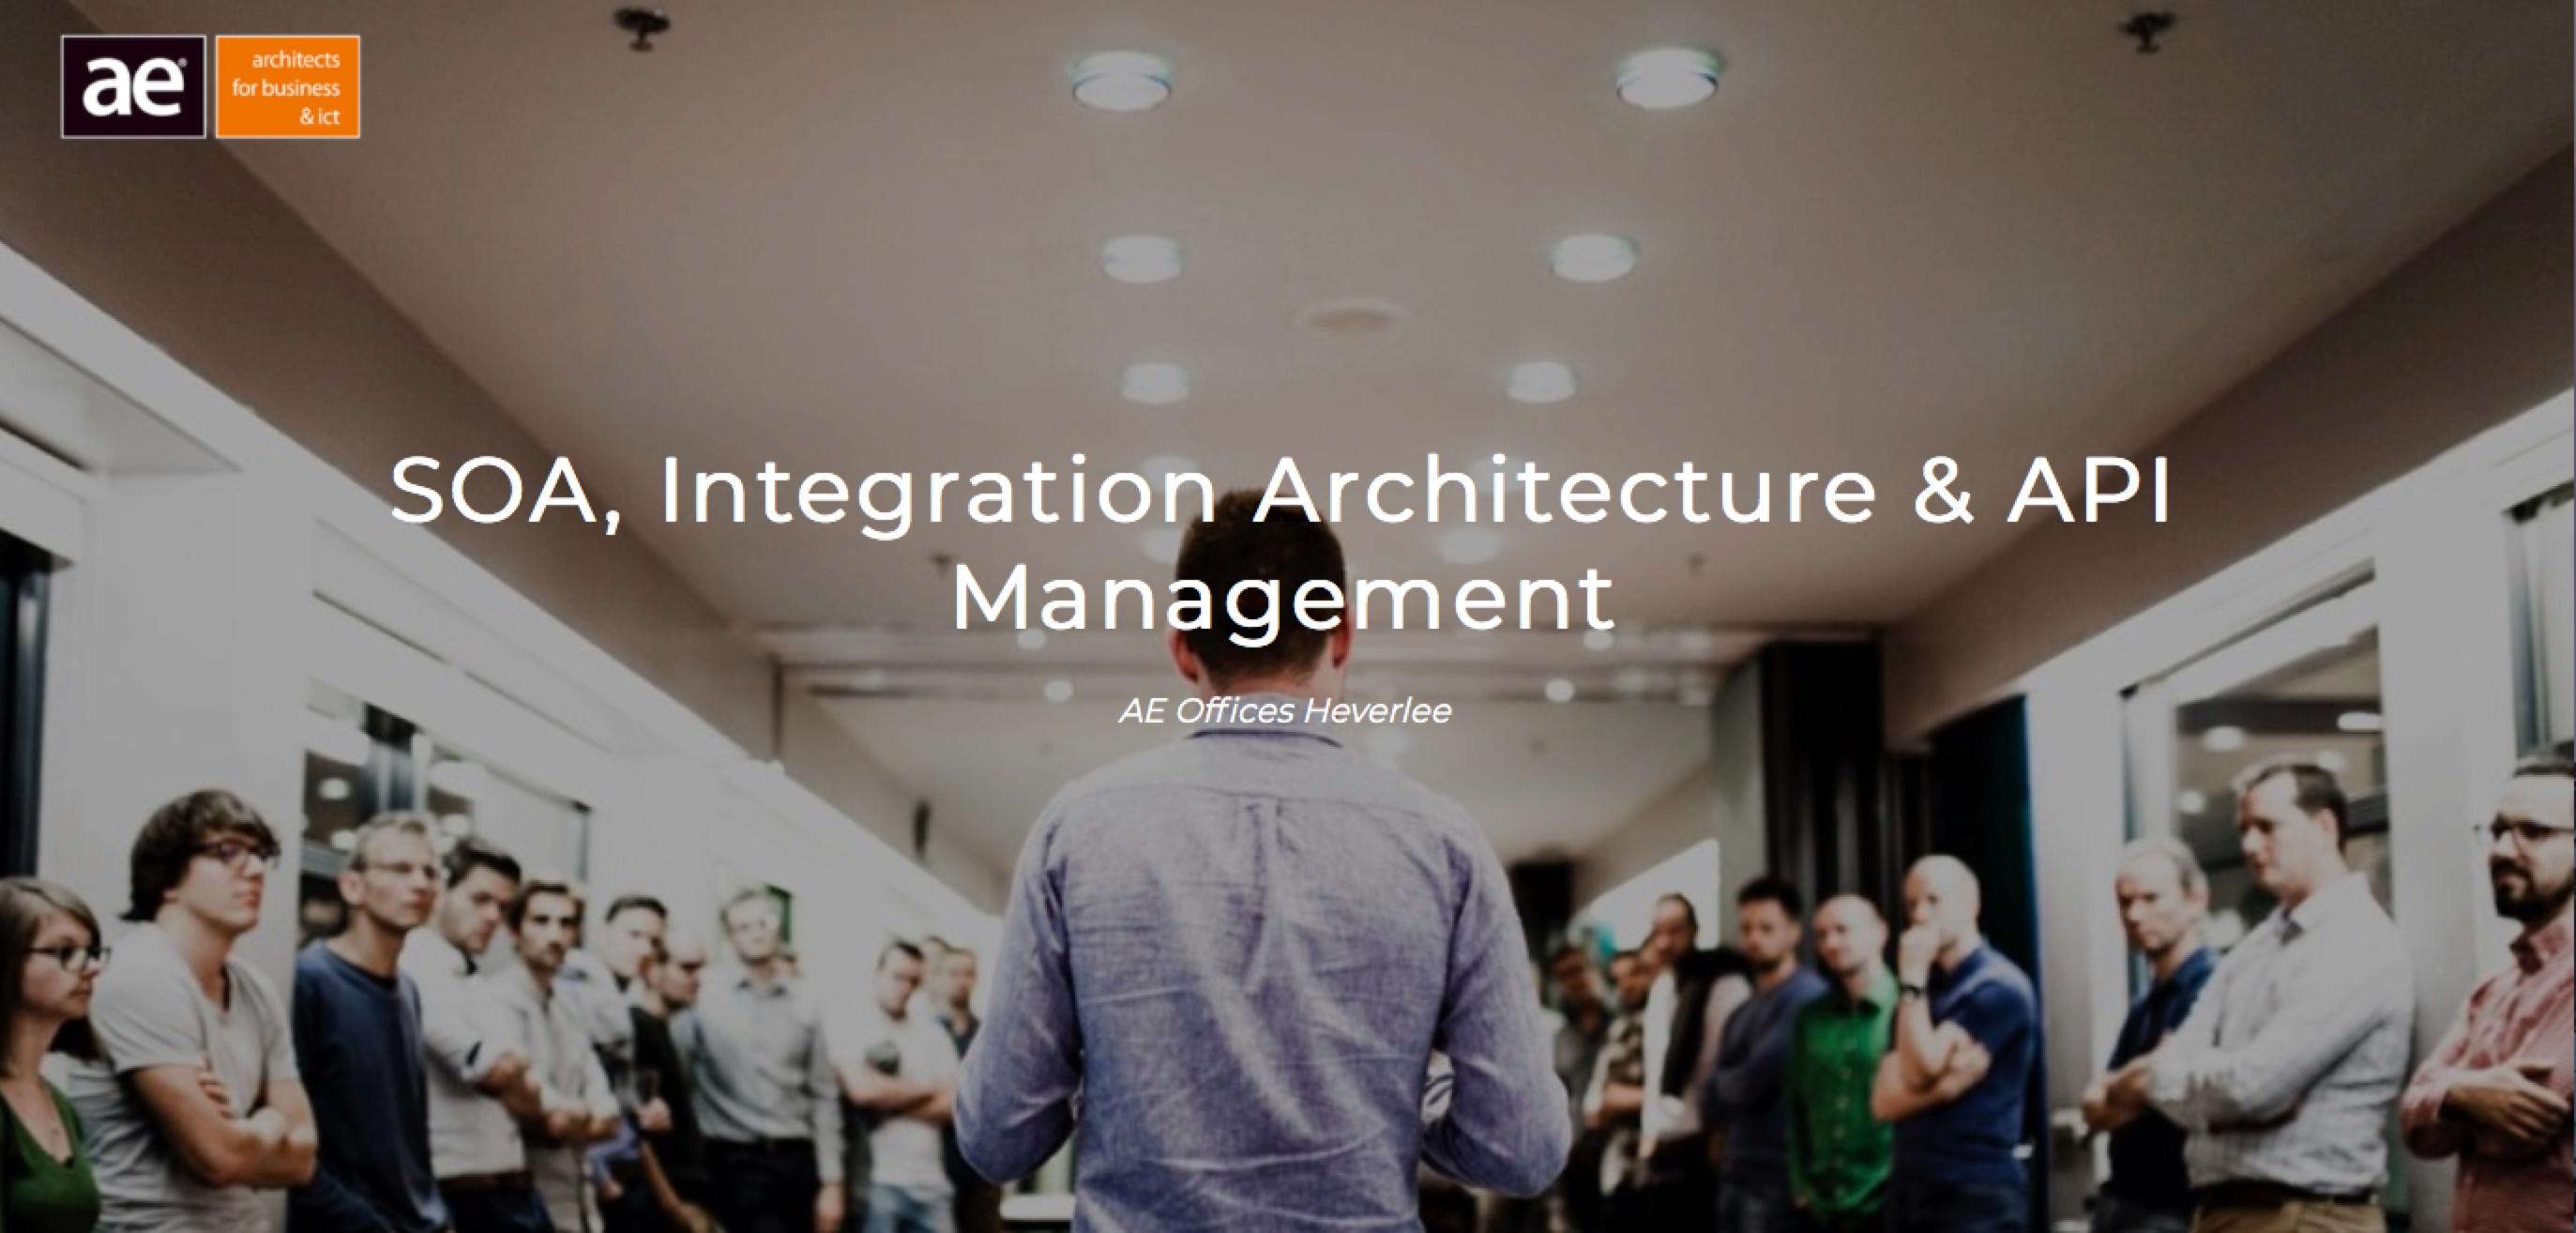 AE Training: SOA, Integration Architecture & API Management